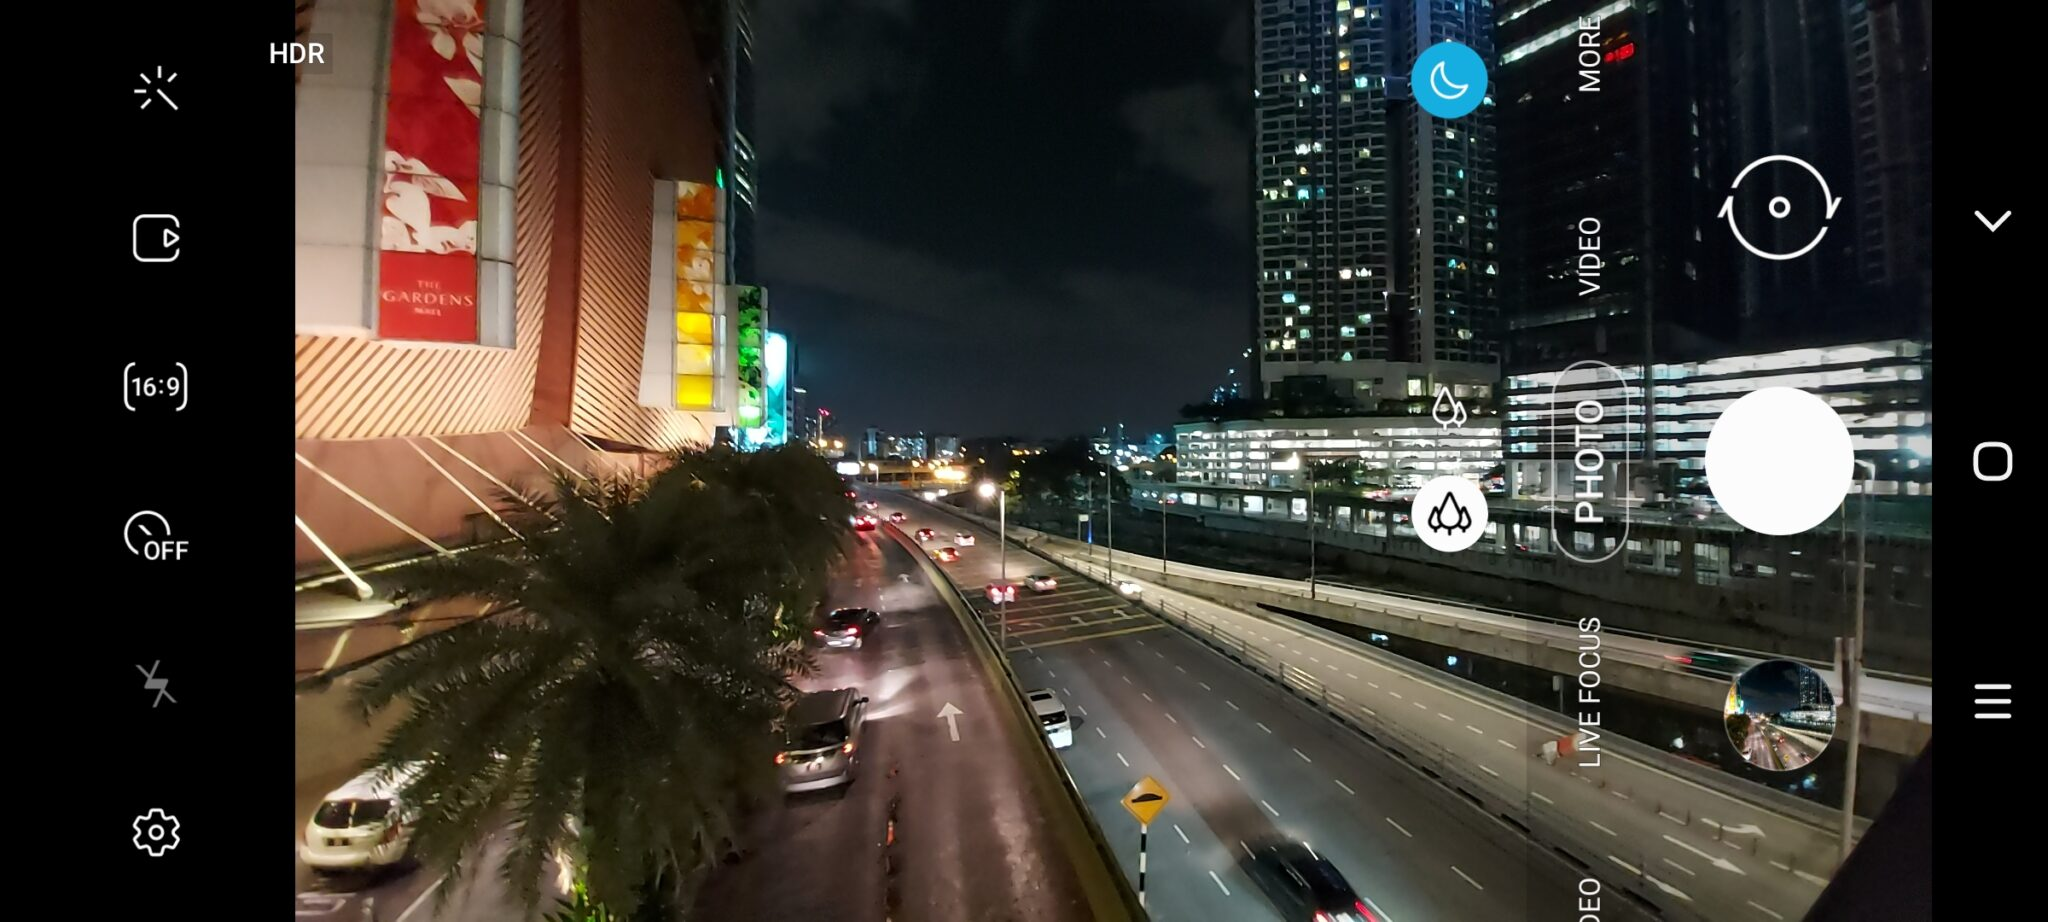 Galaxy S10 Lite camera UI